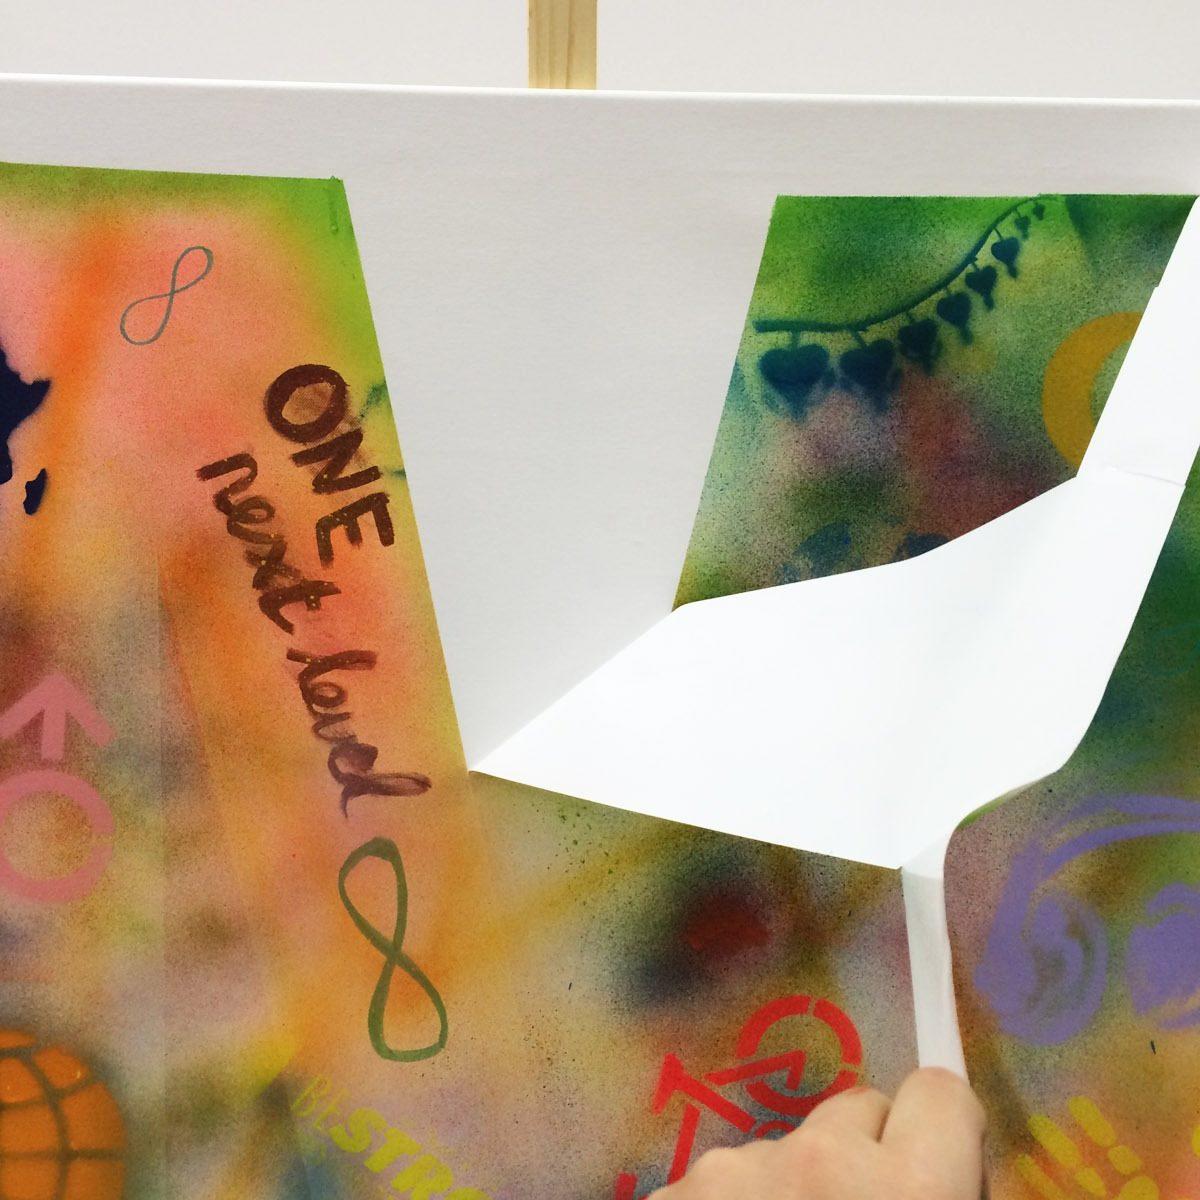 graffitiauftrag-graffitikuenstler-graffitiworkshop-artmos4-hima-paul-hildebrandt-gmbh-leinwand